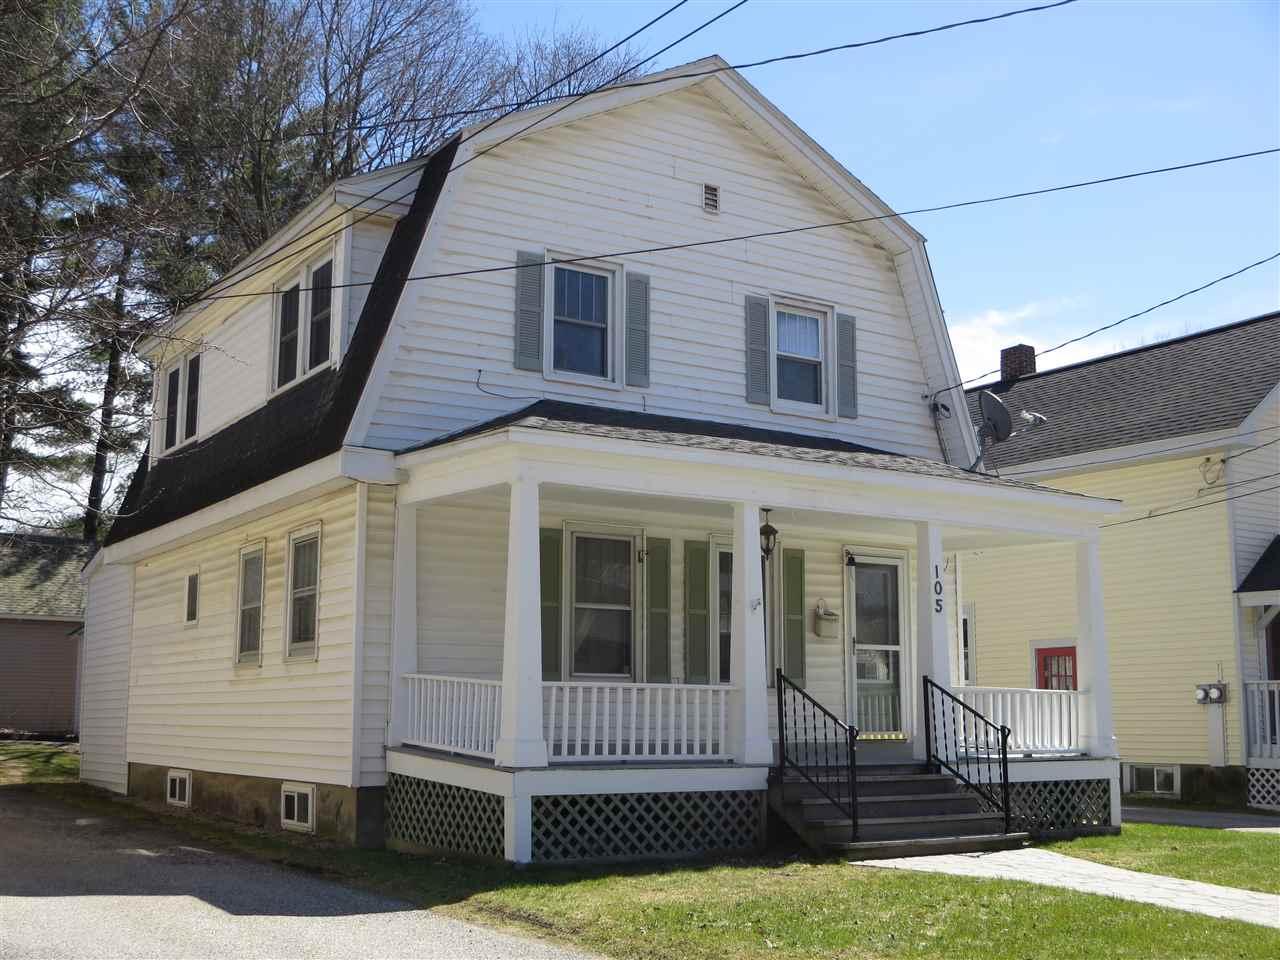 105 branch bennington vt vermont real estate recently